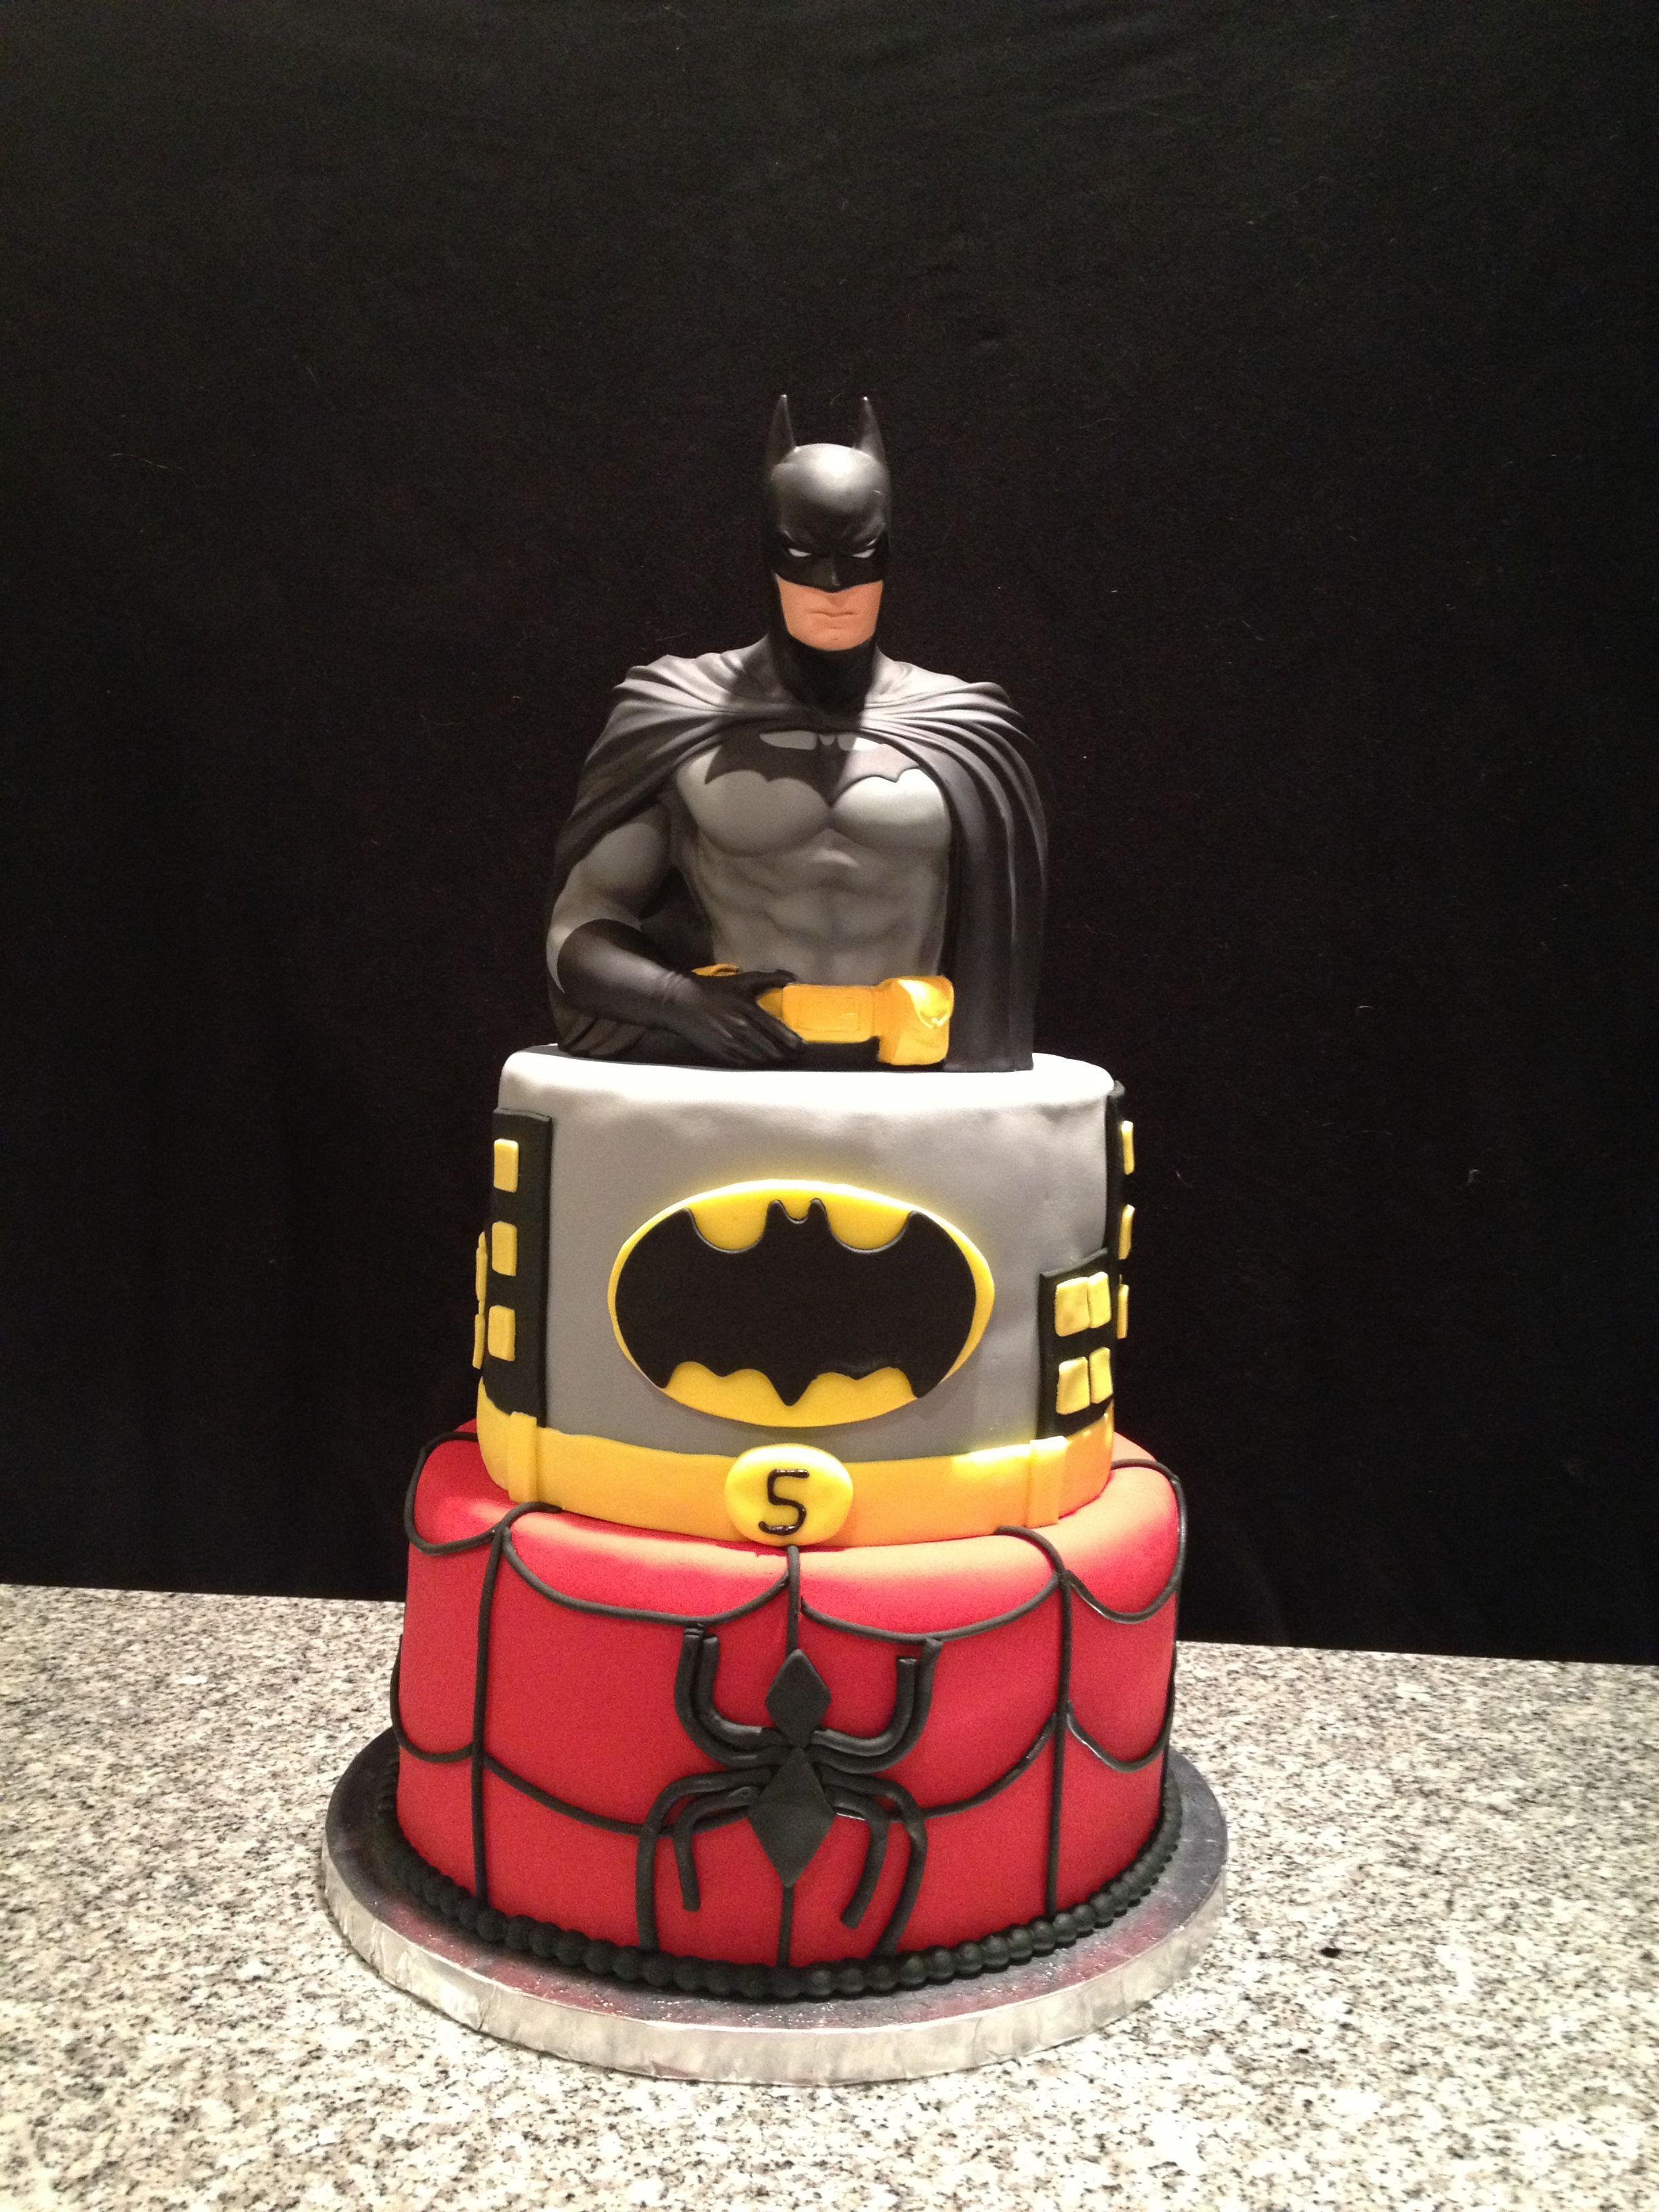 Superhero Cake Superhero cake, Superhero party, Creative